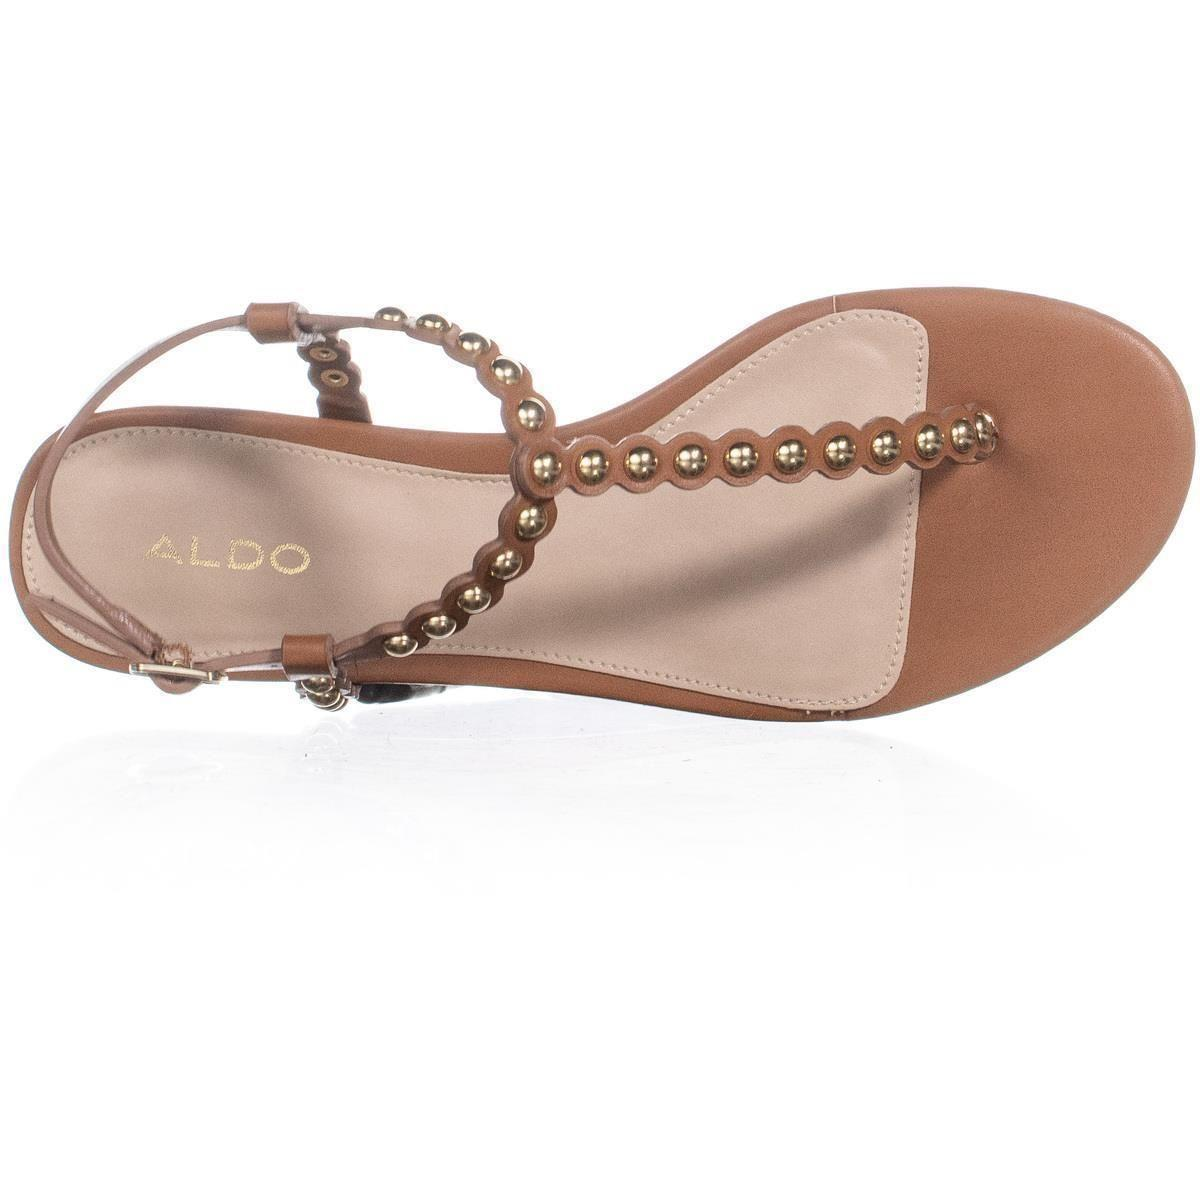 5cd01460f234 Lyst - ALDO Balata Flat T-strap Buckle Sandals - Save 13%